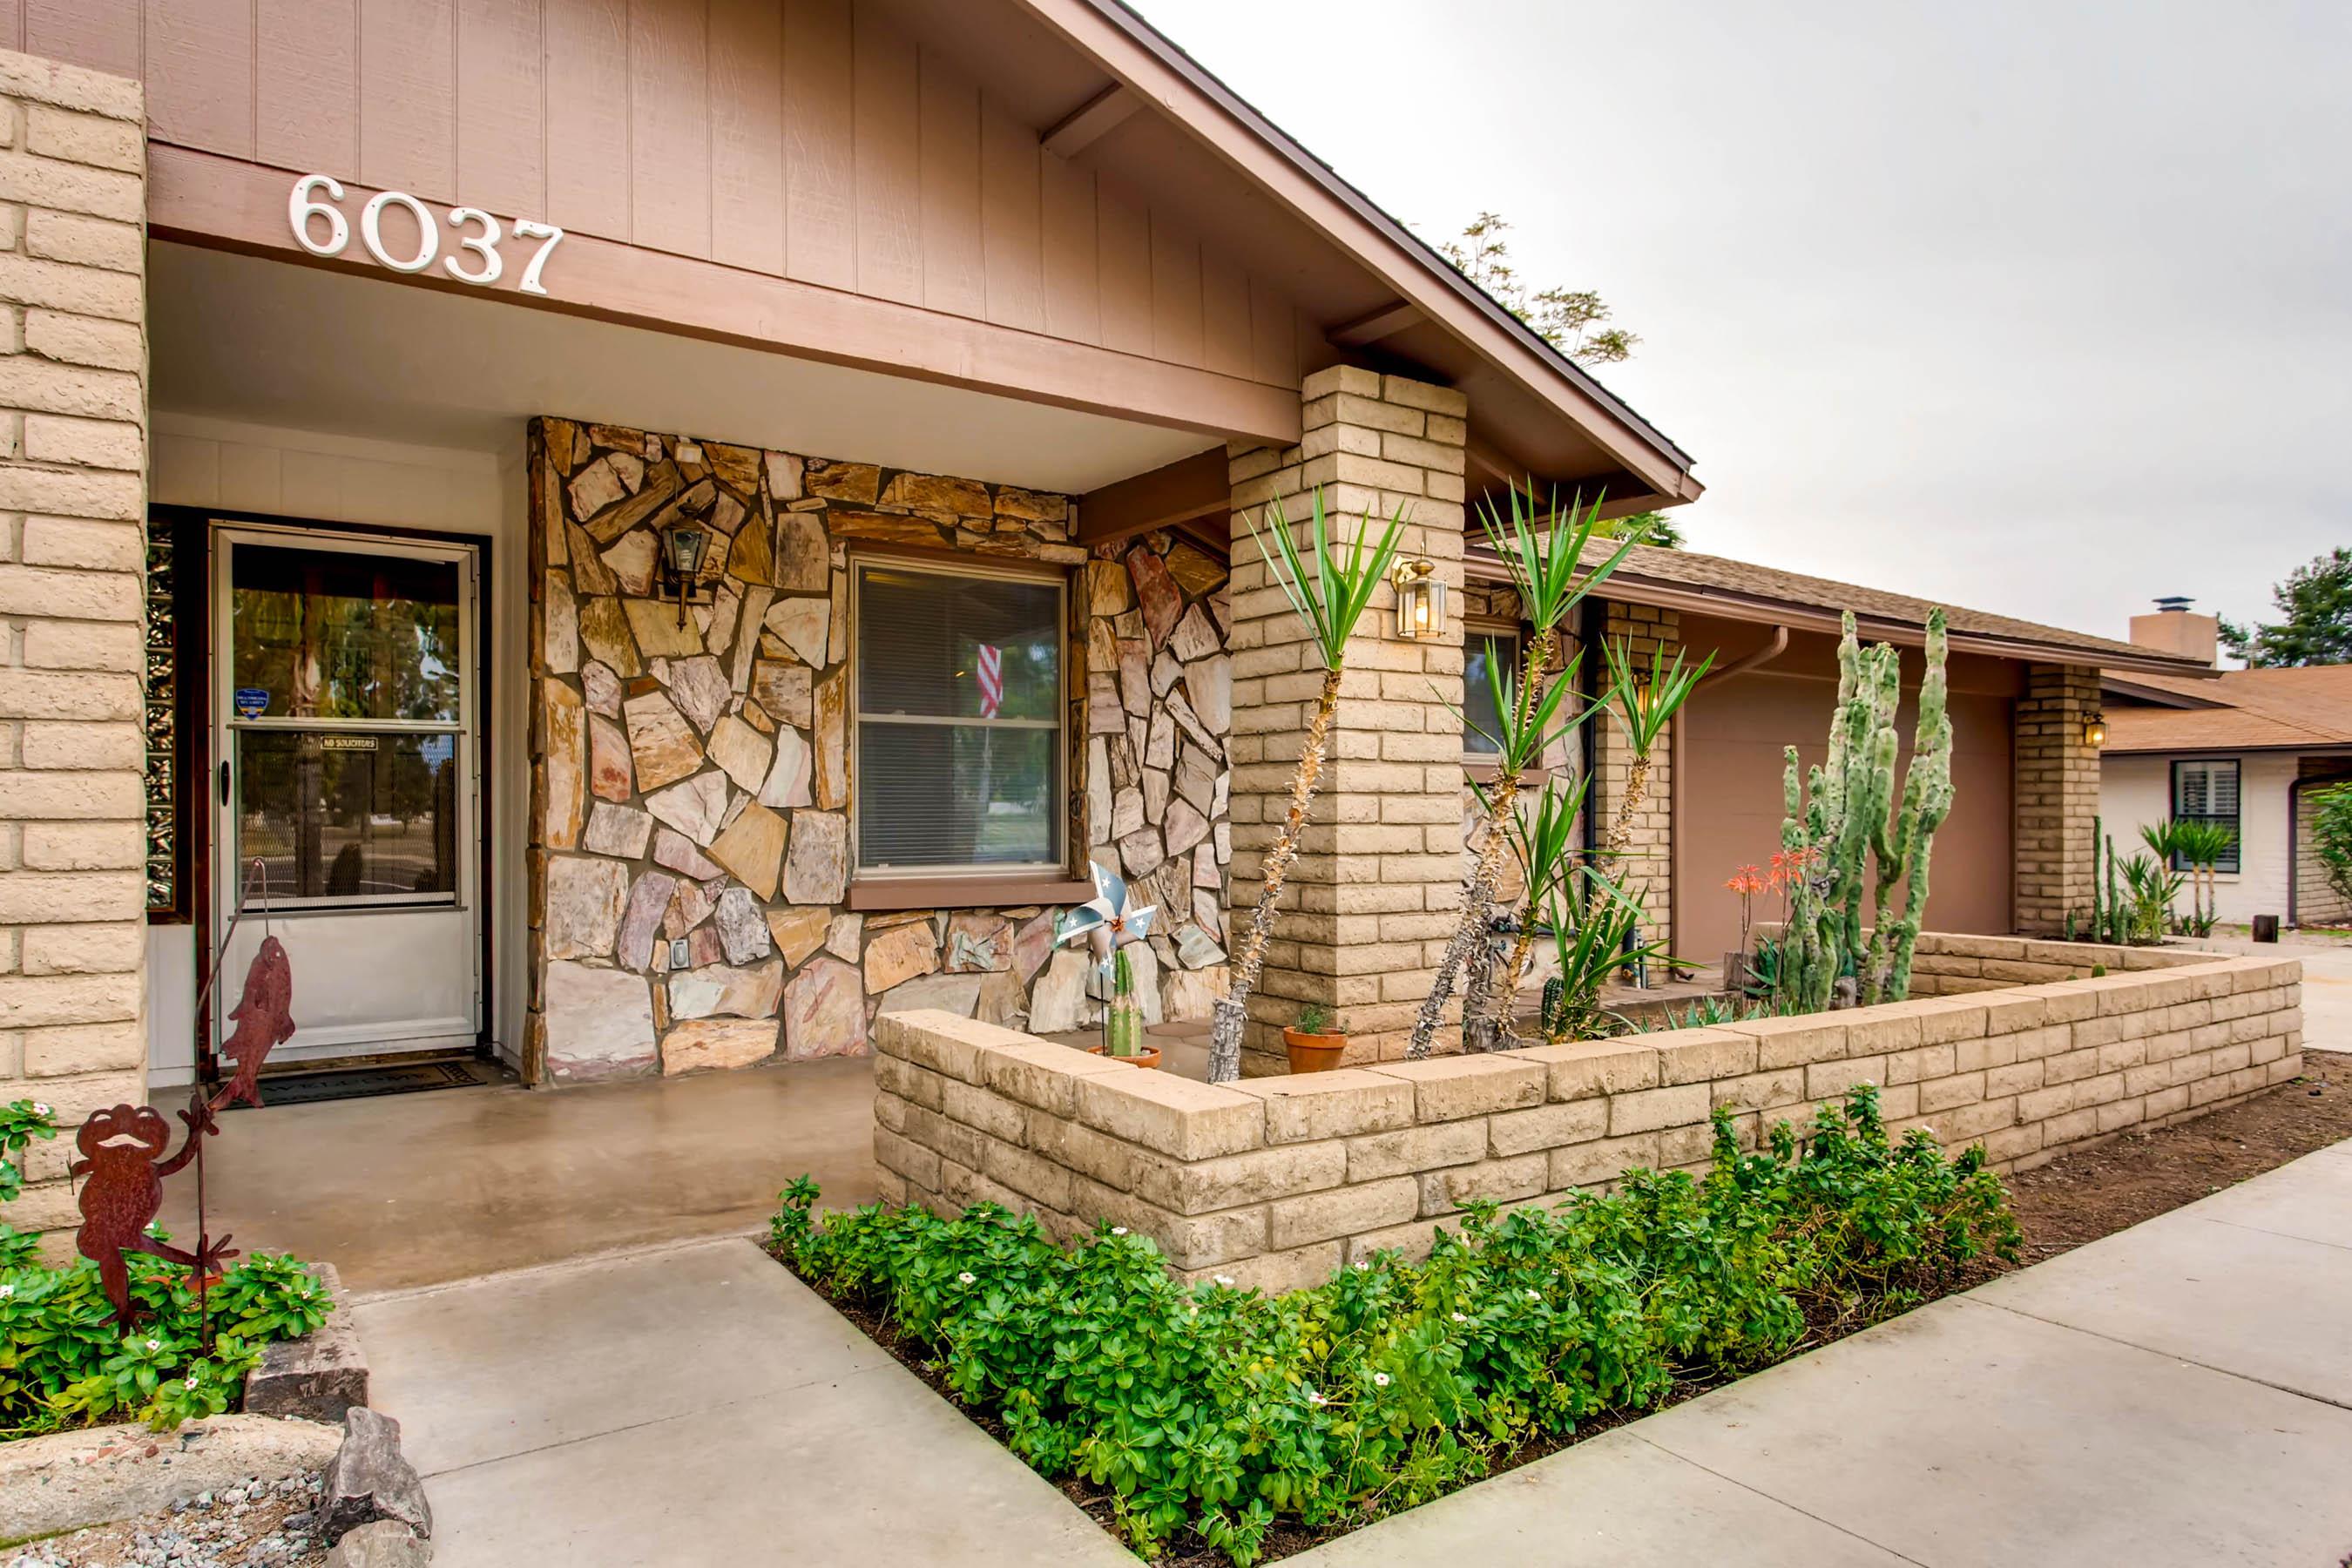 House for rent in mesa az house plan 2017 for Blandford homes floor plans